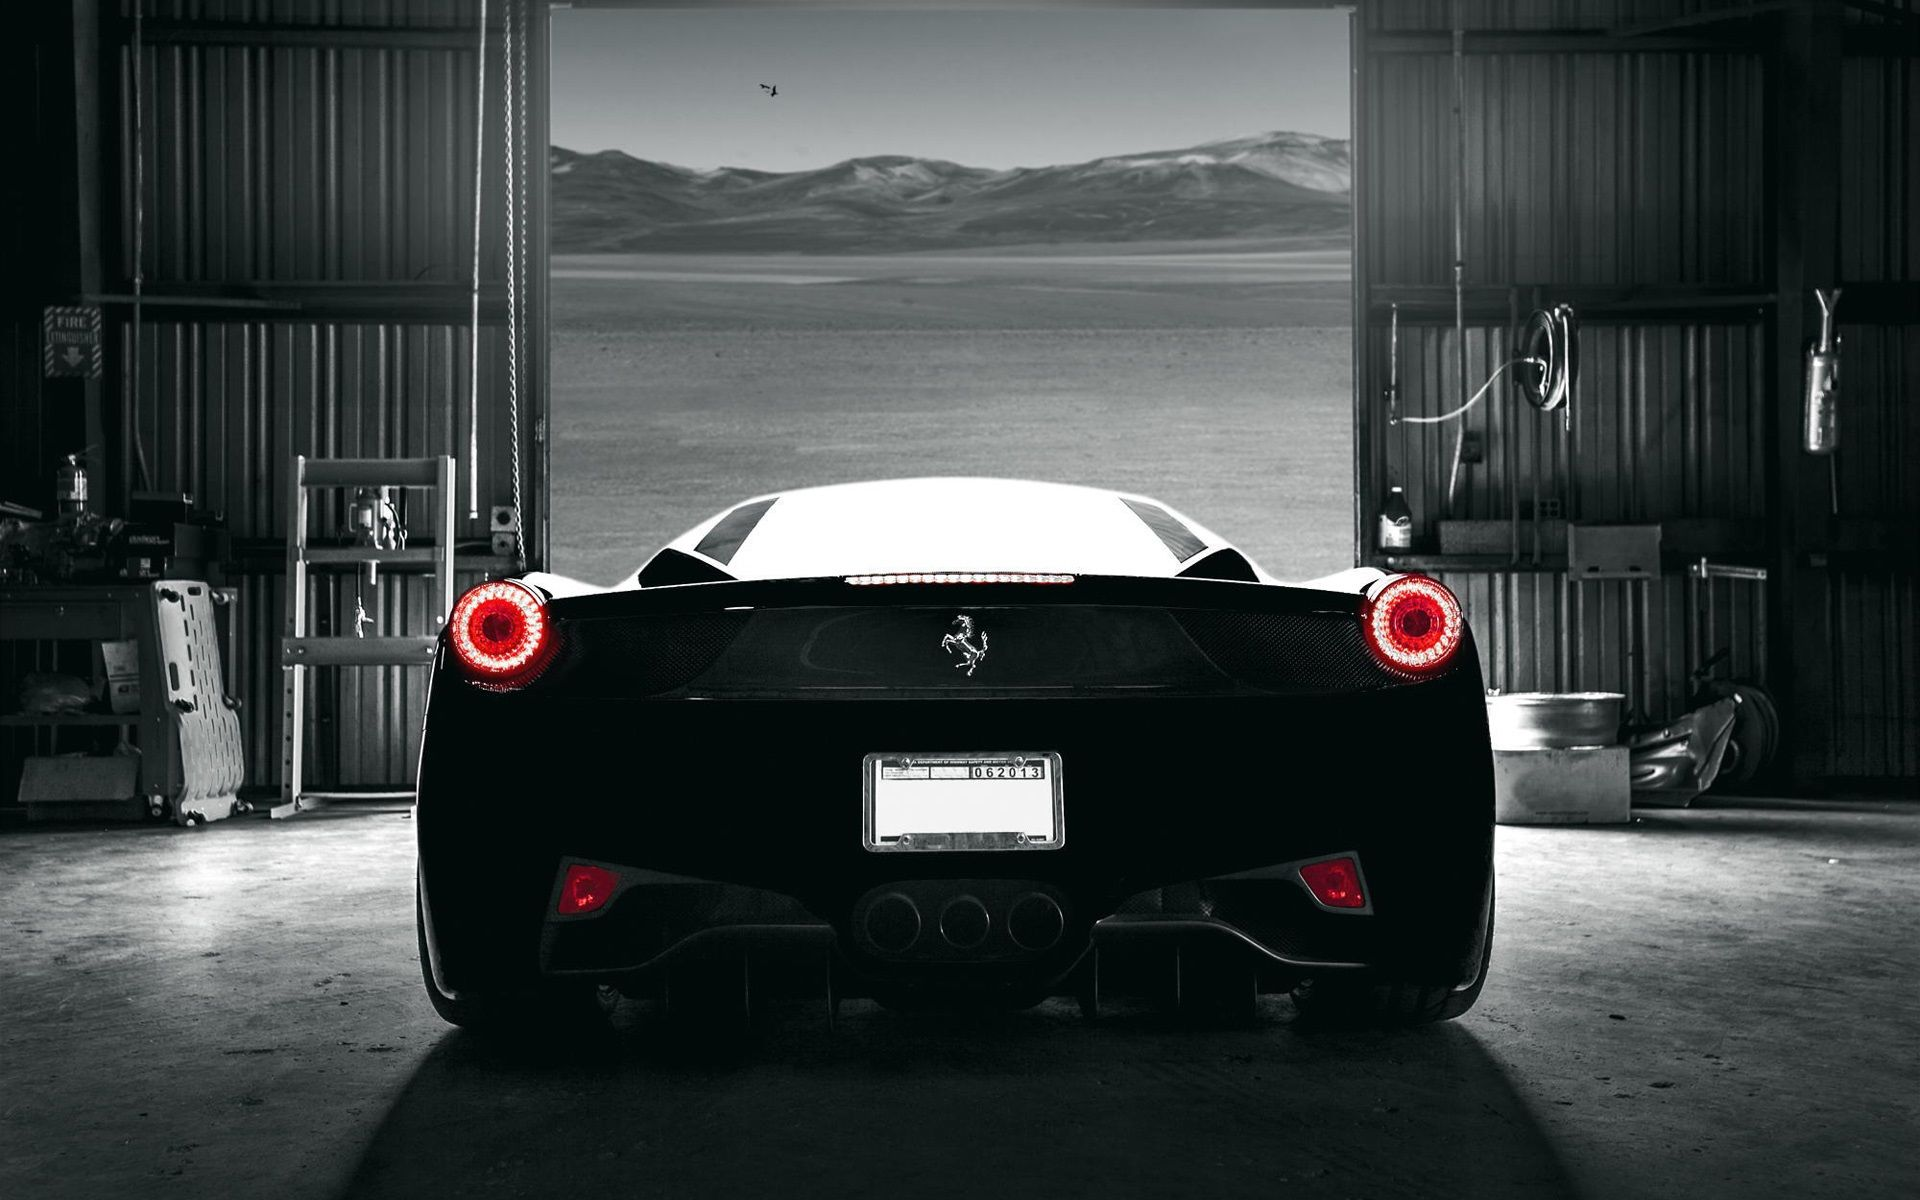 Black Ferrari Wallpapers Top Free Black Ferrari Backgrounds